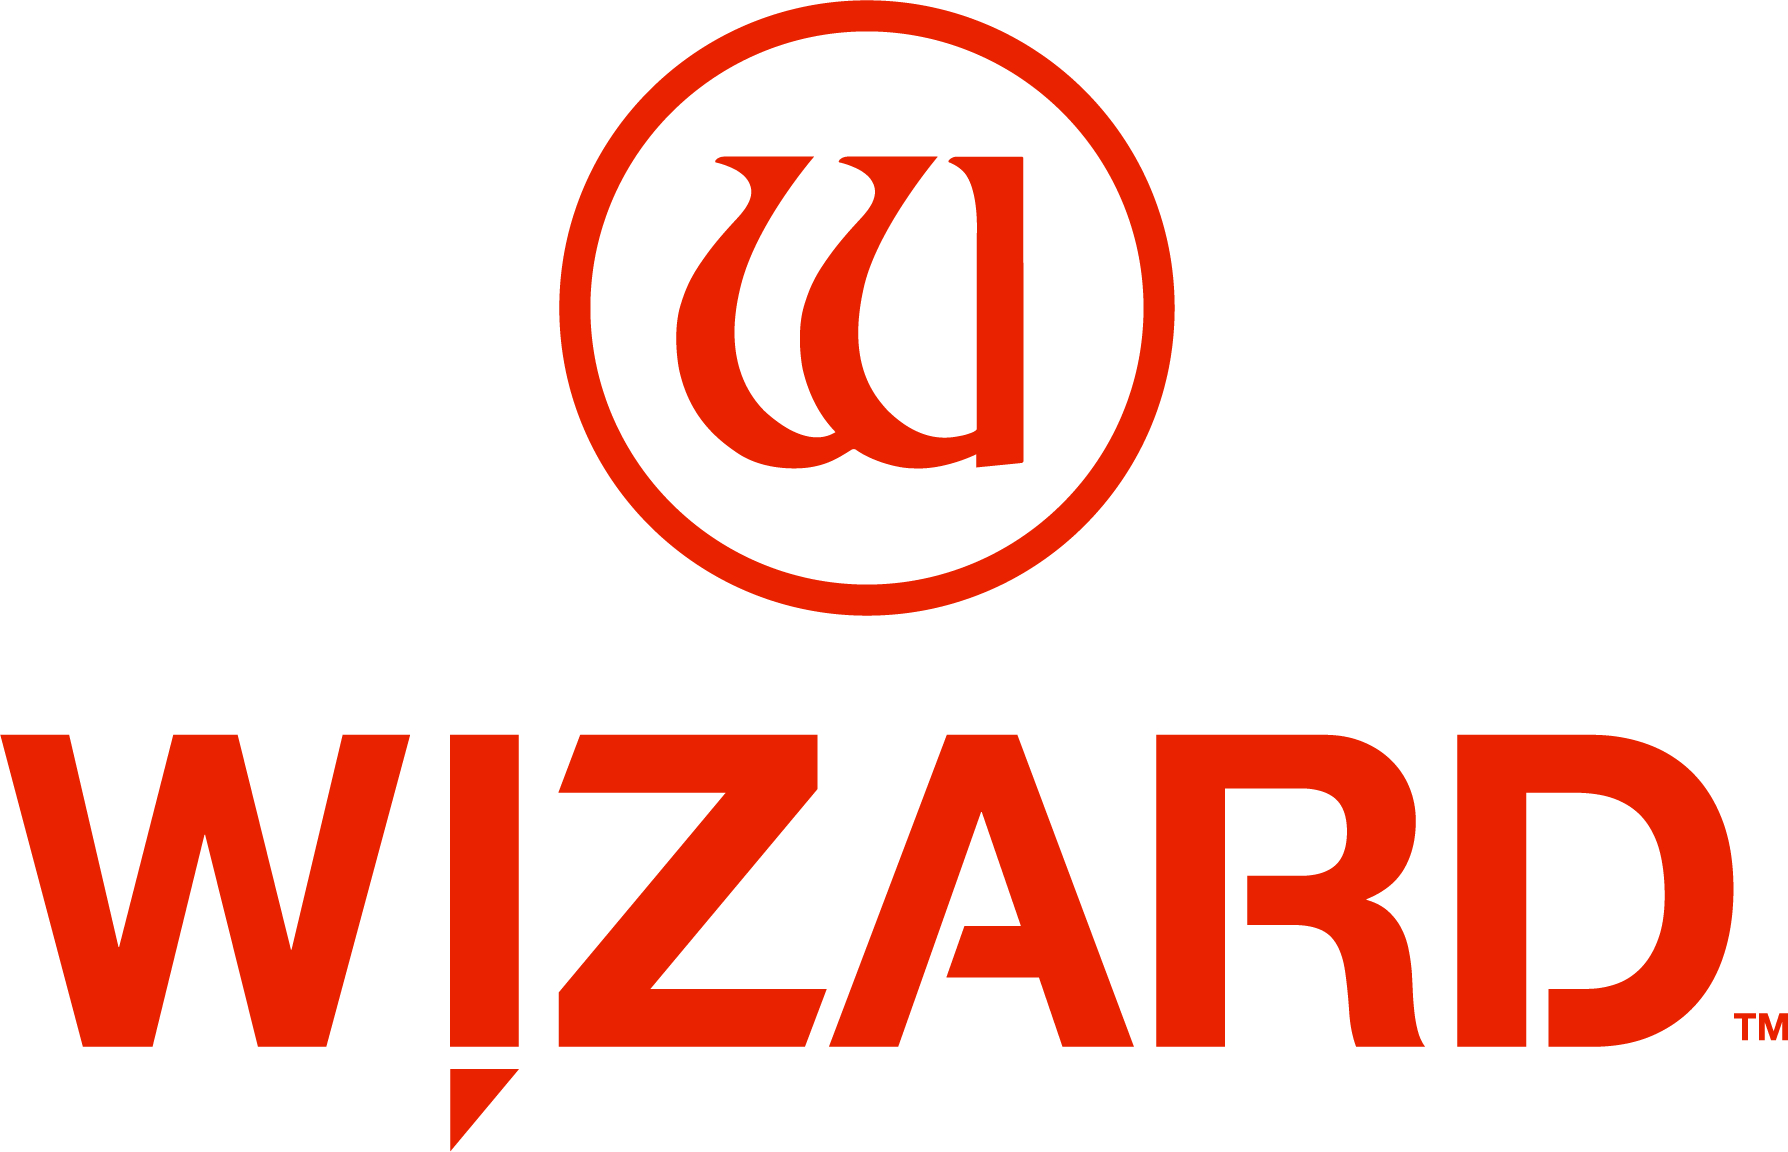 Wizard Webstore